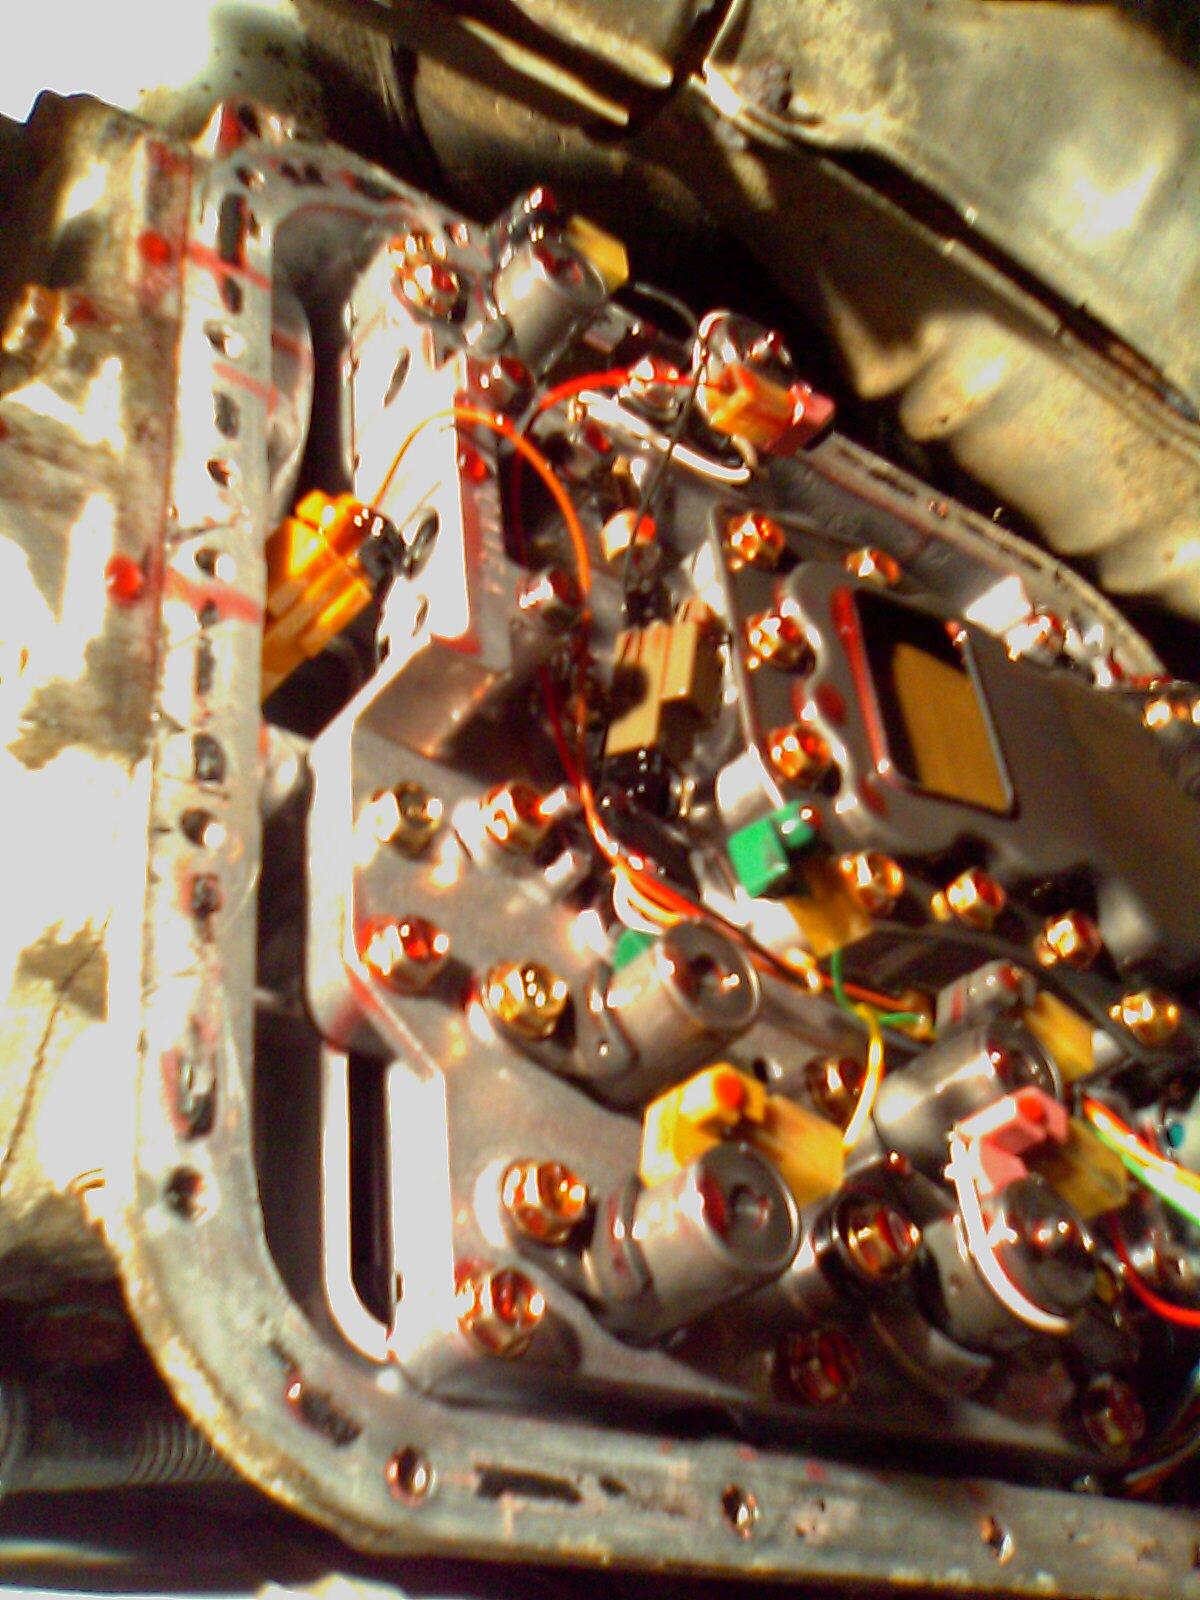 P0748 code subaru   P0748 Subaru Pressure Control Solenoid A